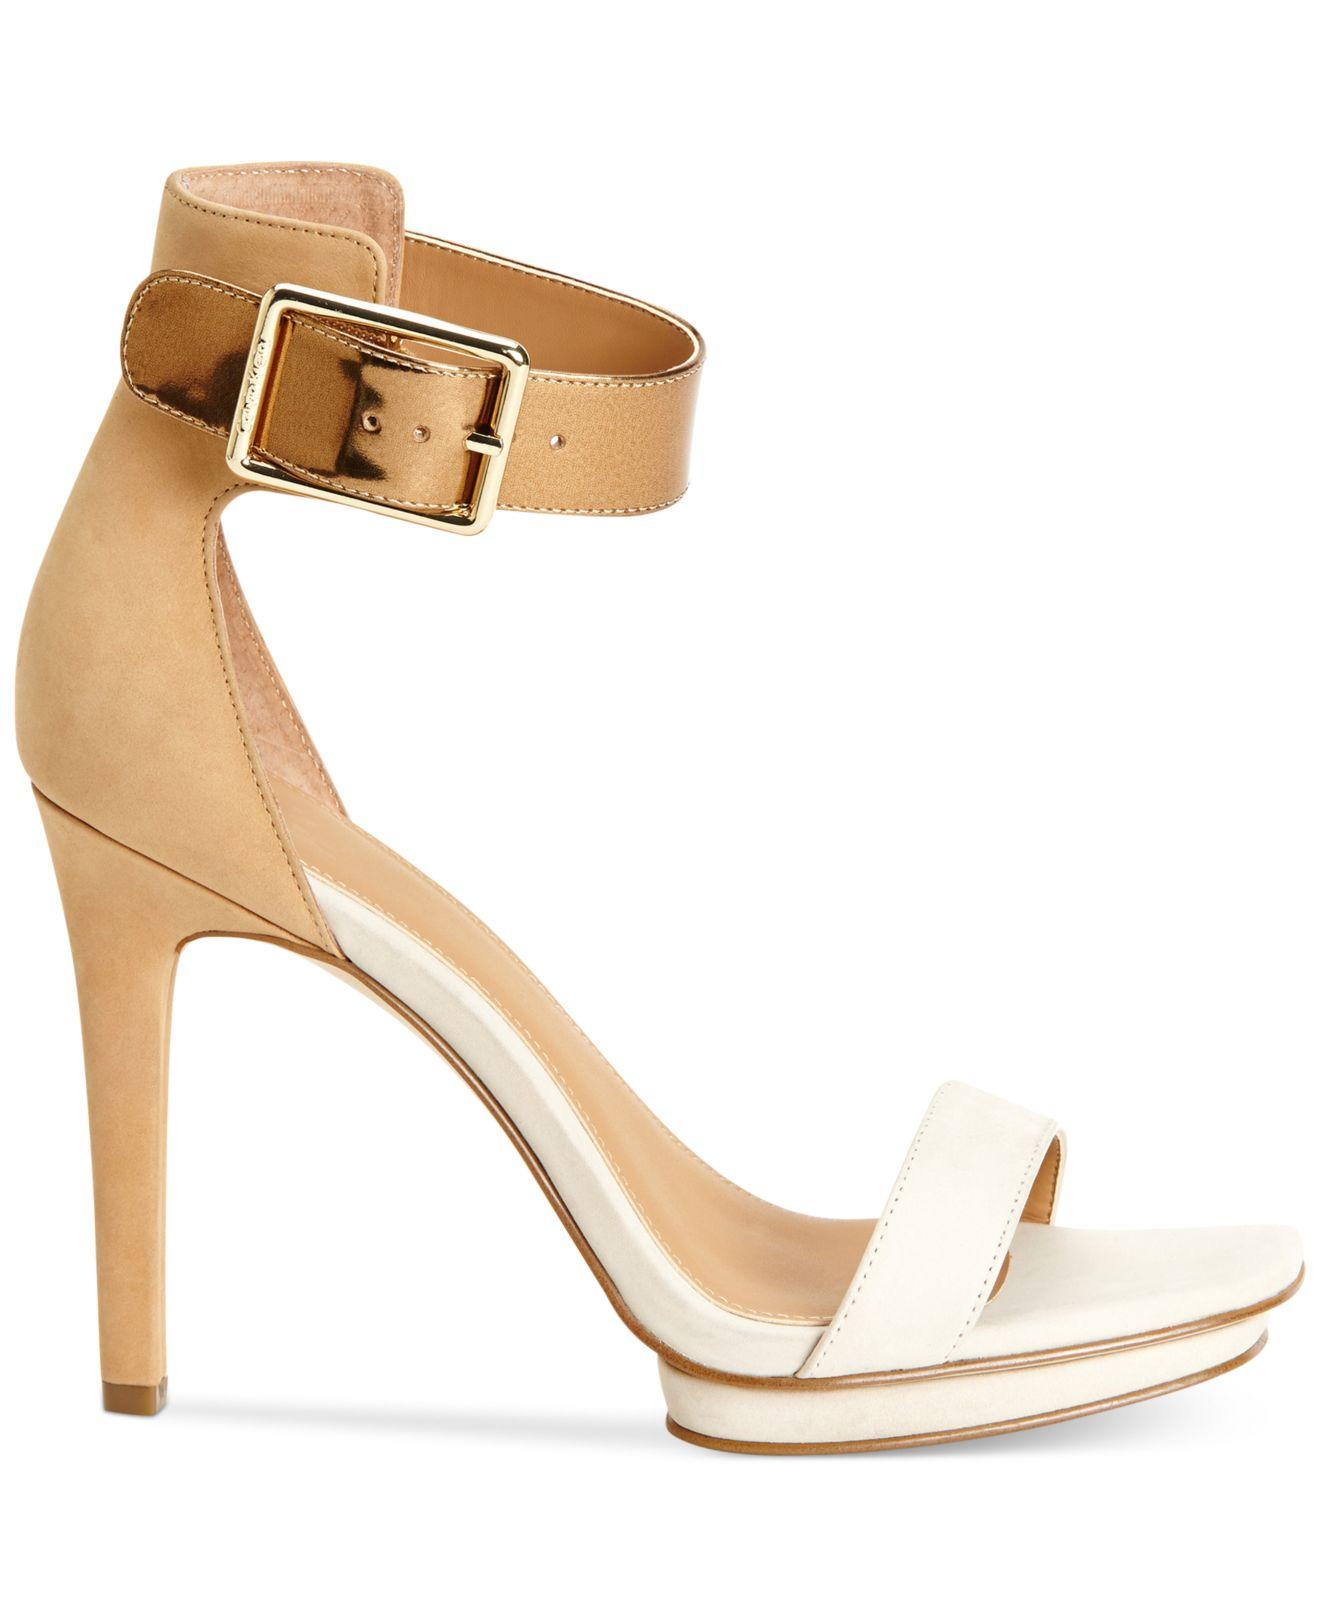 f9dfcd76308 Lyst - Calvin Klein Women s Vable Sandals in White